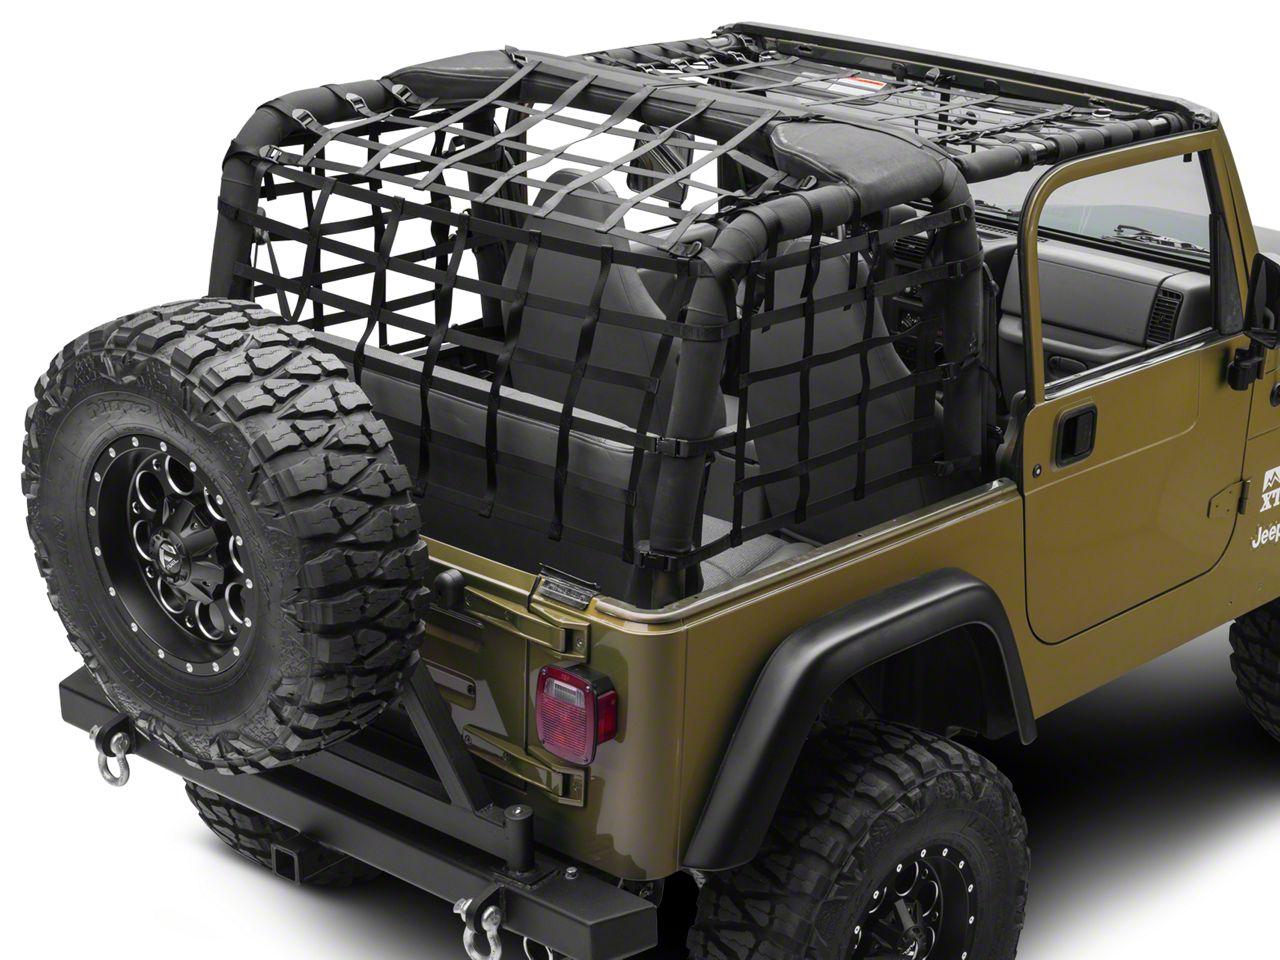 PrimalTech Complete Netting Kit (92-06 Jeep Wrangler YJ & TJ)